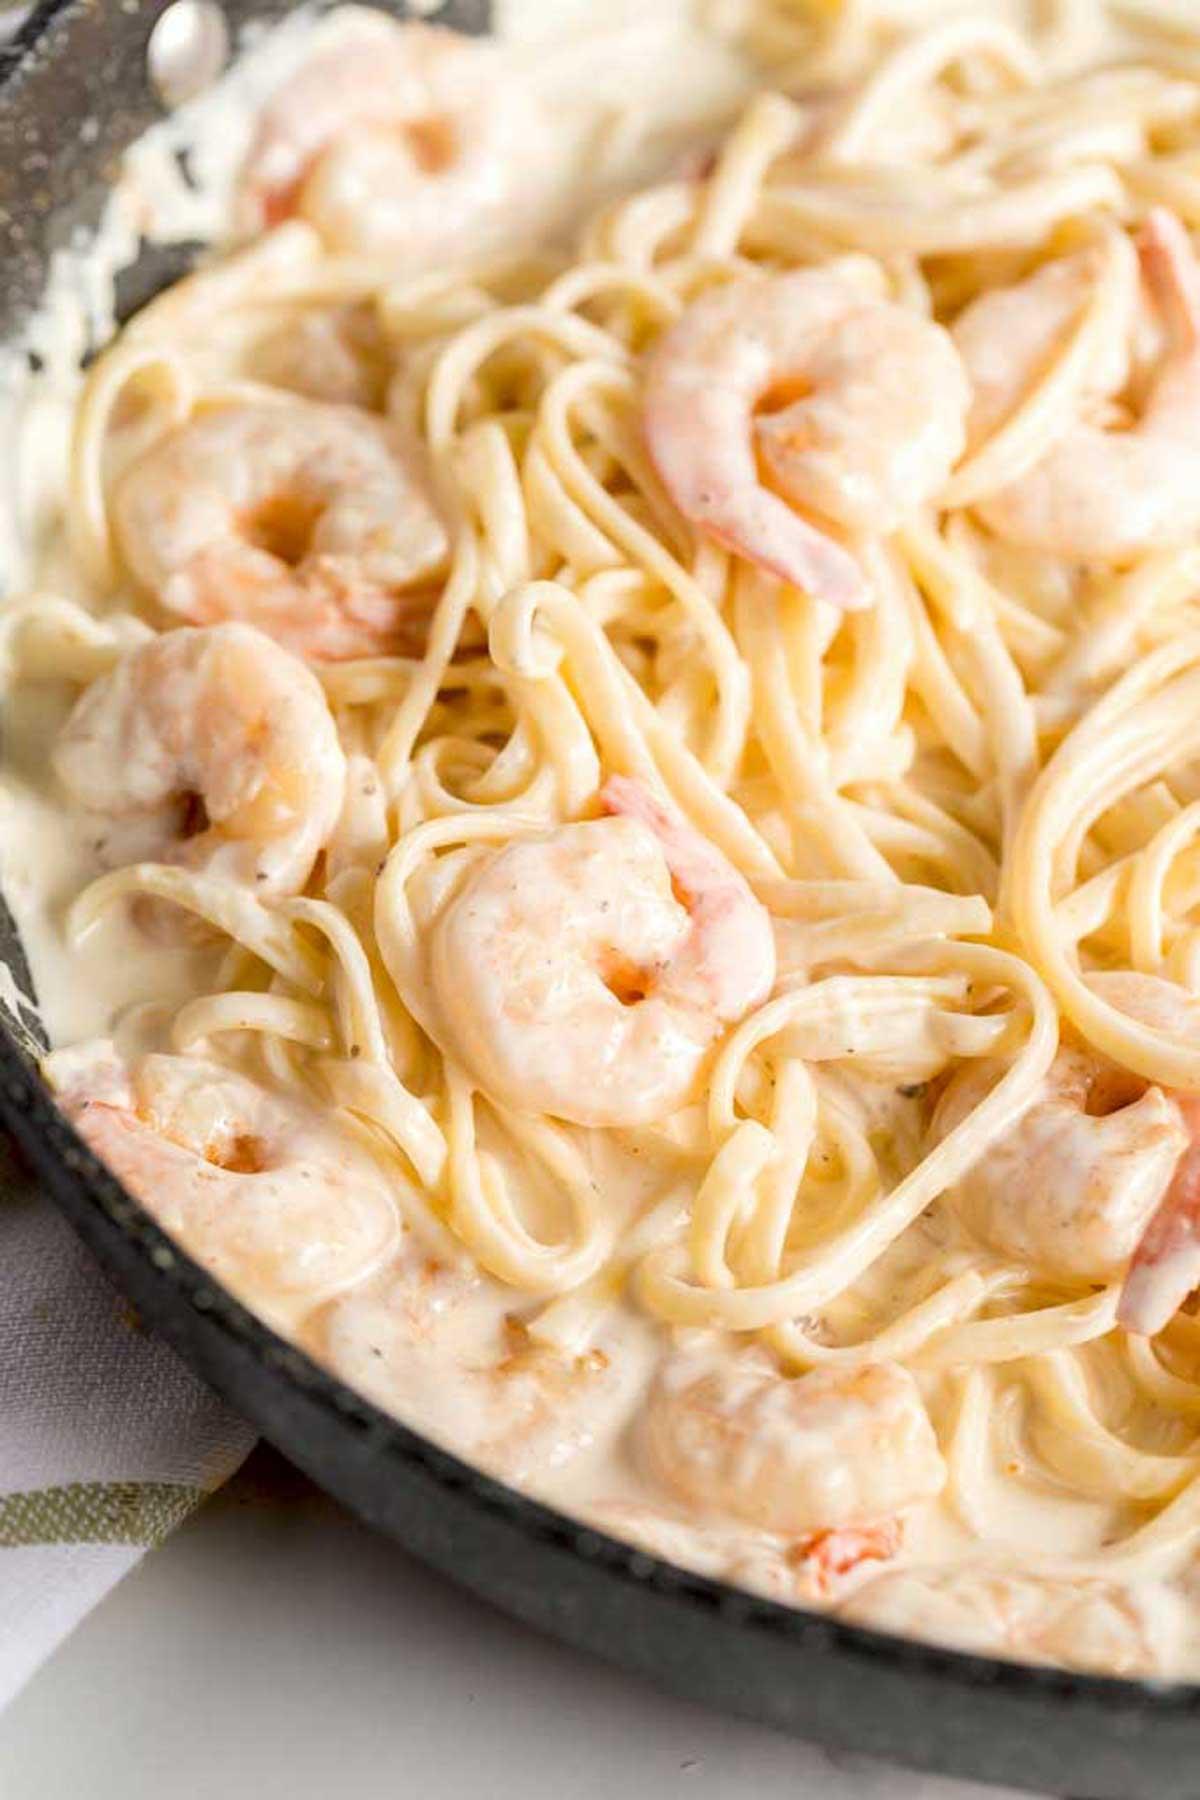 Creamy Cajun Alfredo Shrimp Pasta in a skillet.